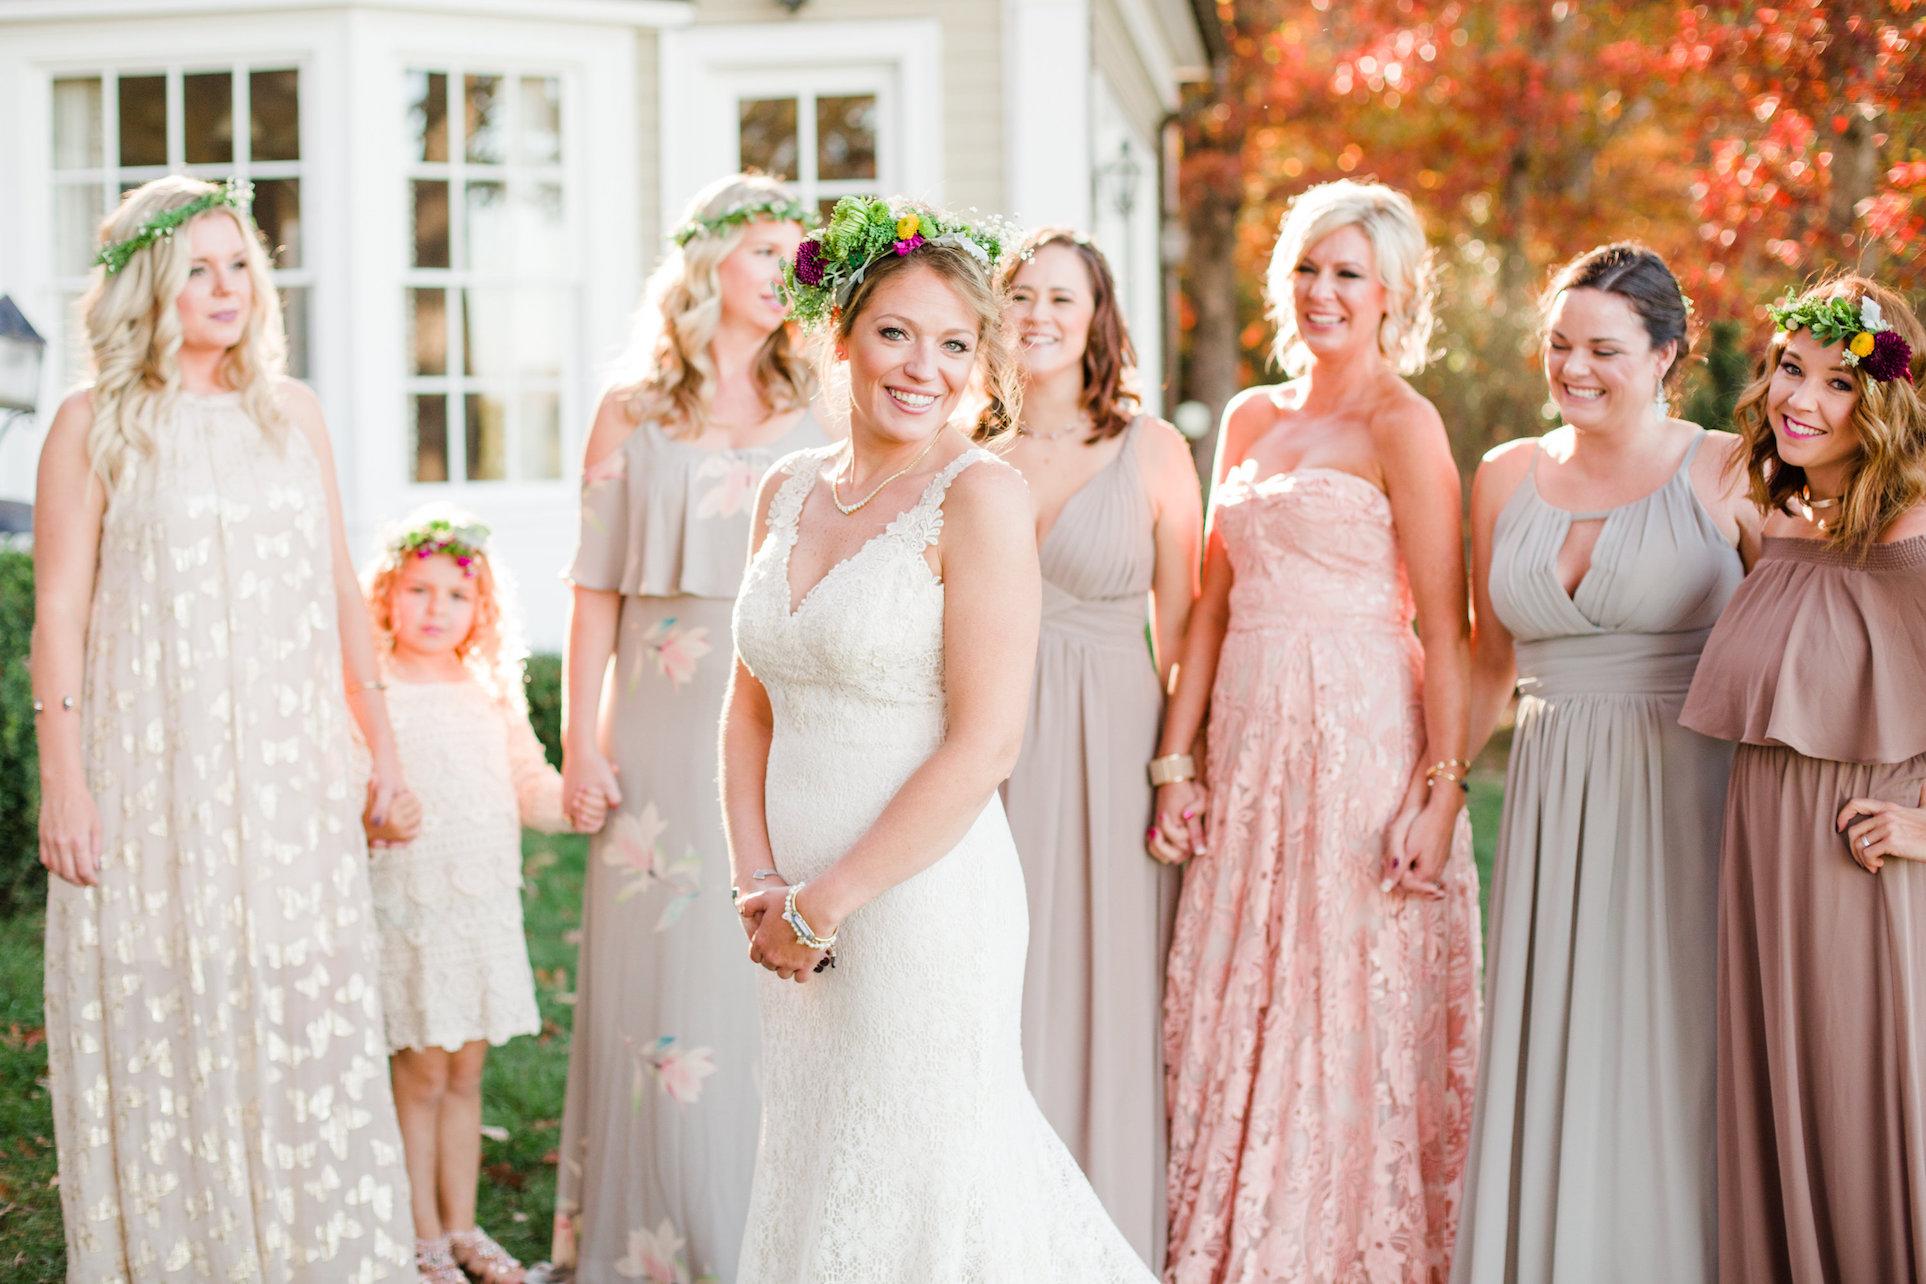 beautiful bride and bridesmaids at vintage style wedding